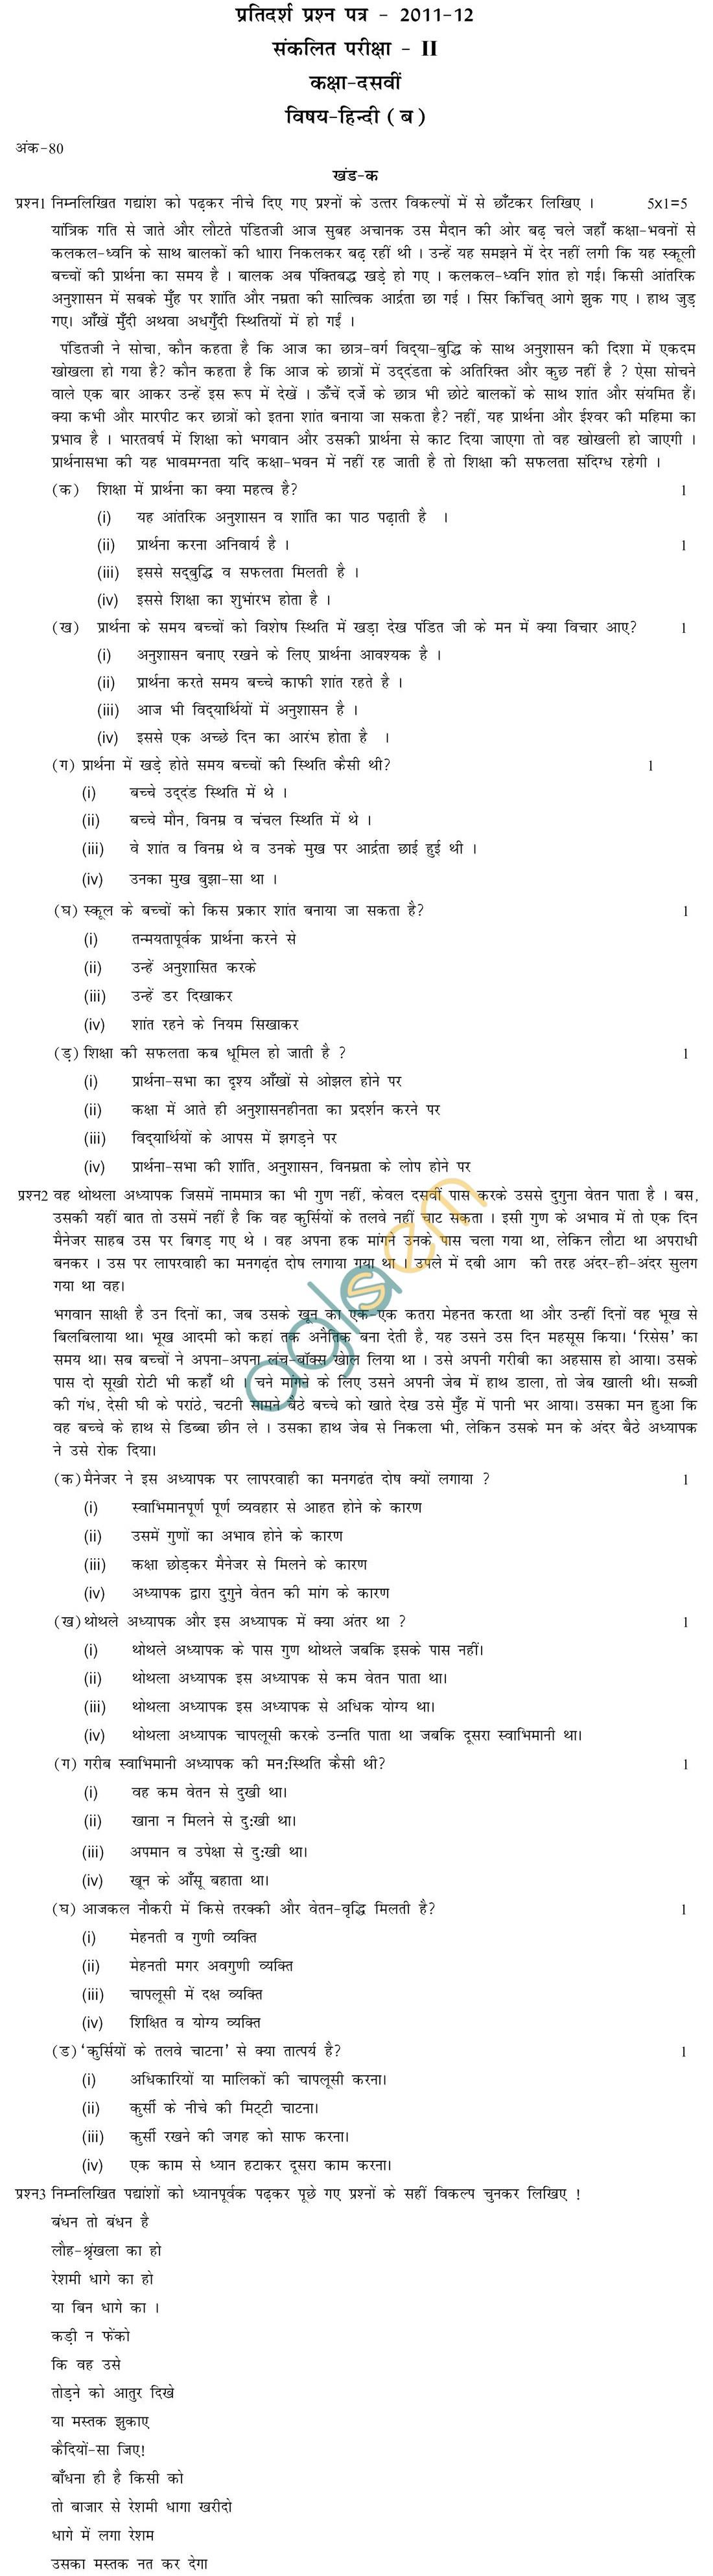 Maths Mcq Questions For Class 10 Cbse Sa2